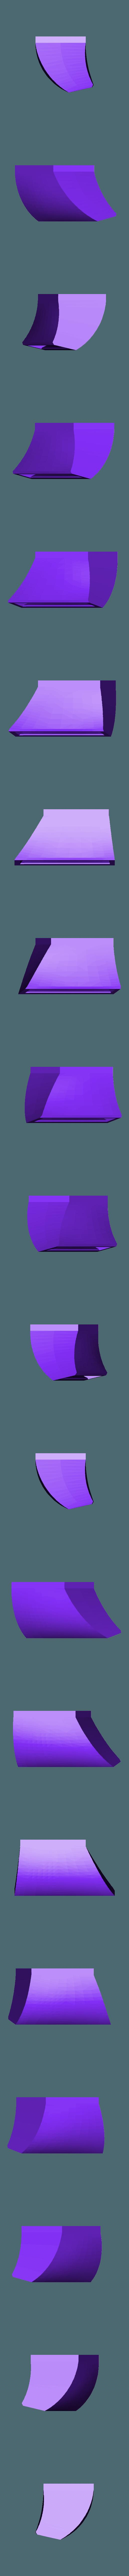 Fanduct_e3dv6_derecho_v5.STL Download free STL file Prusa I3 Steel V2 Makerparts - Laser Cut • Template to 3D print, Agos3D